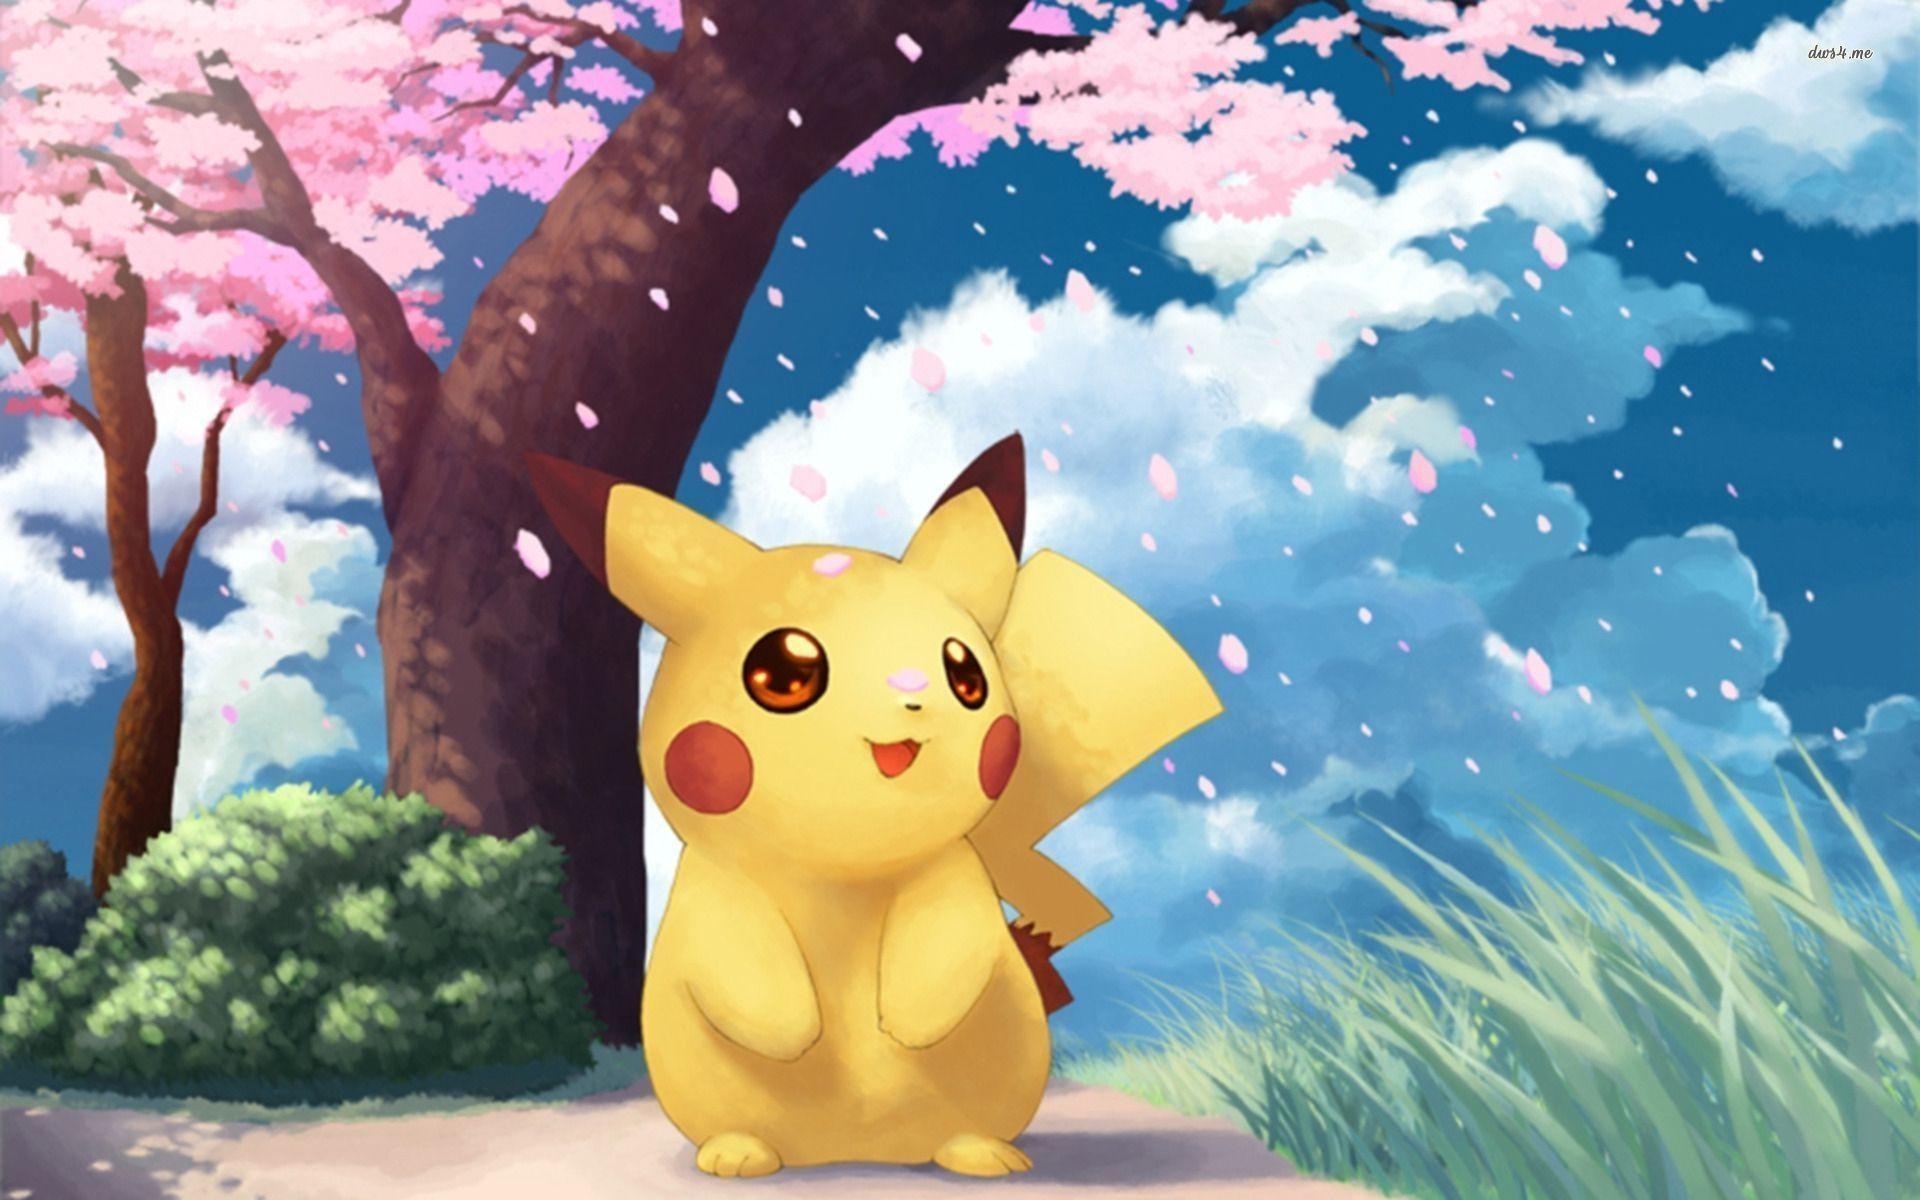 Most Downloaded Pokemon Pikachu Wallpapers – Full HD wallpaper search